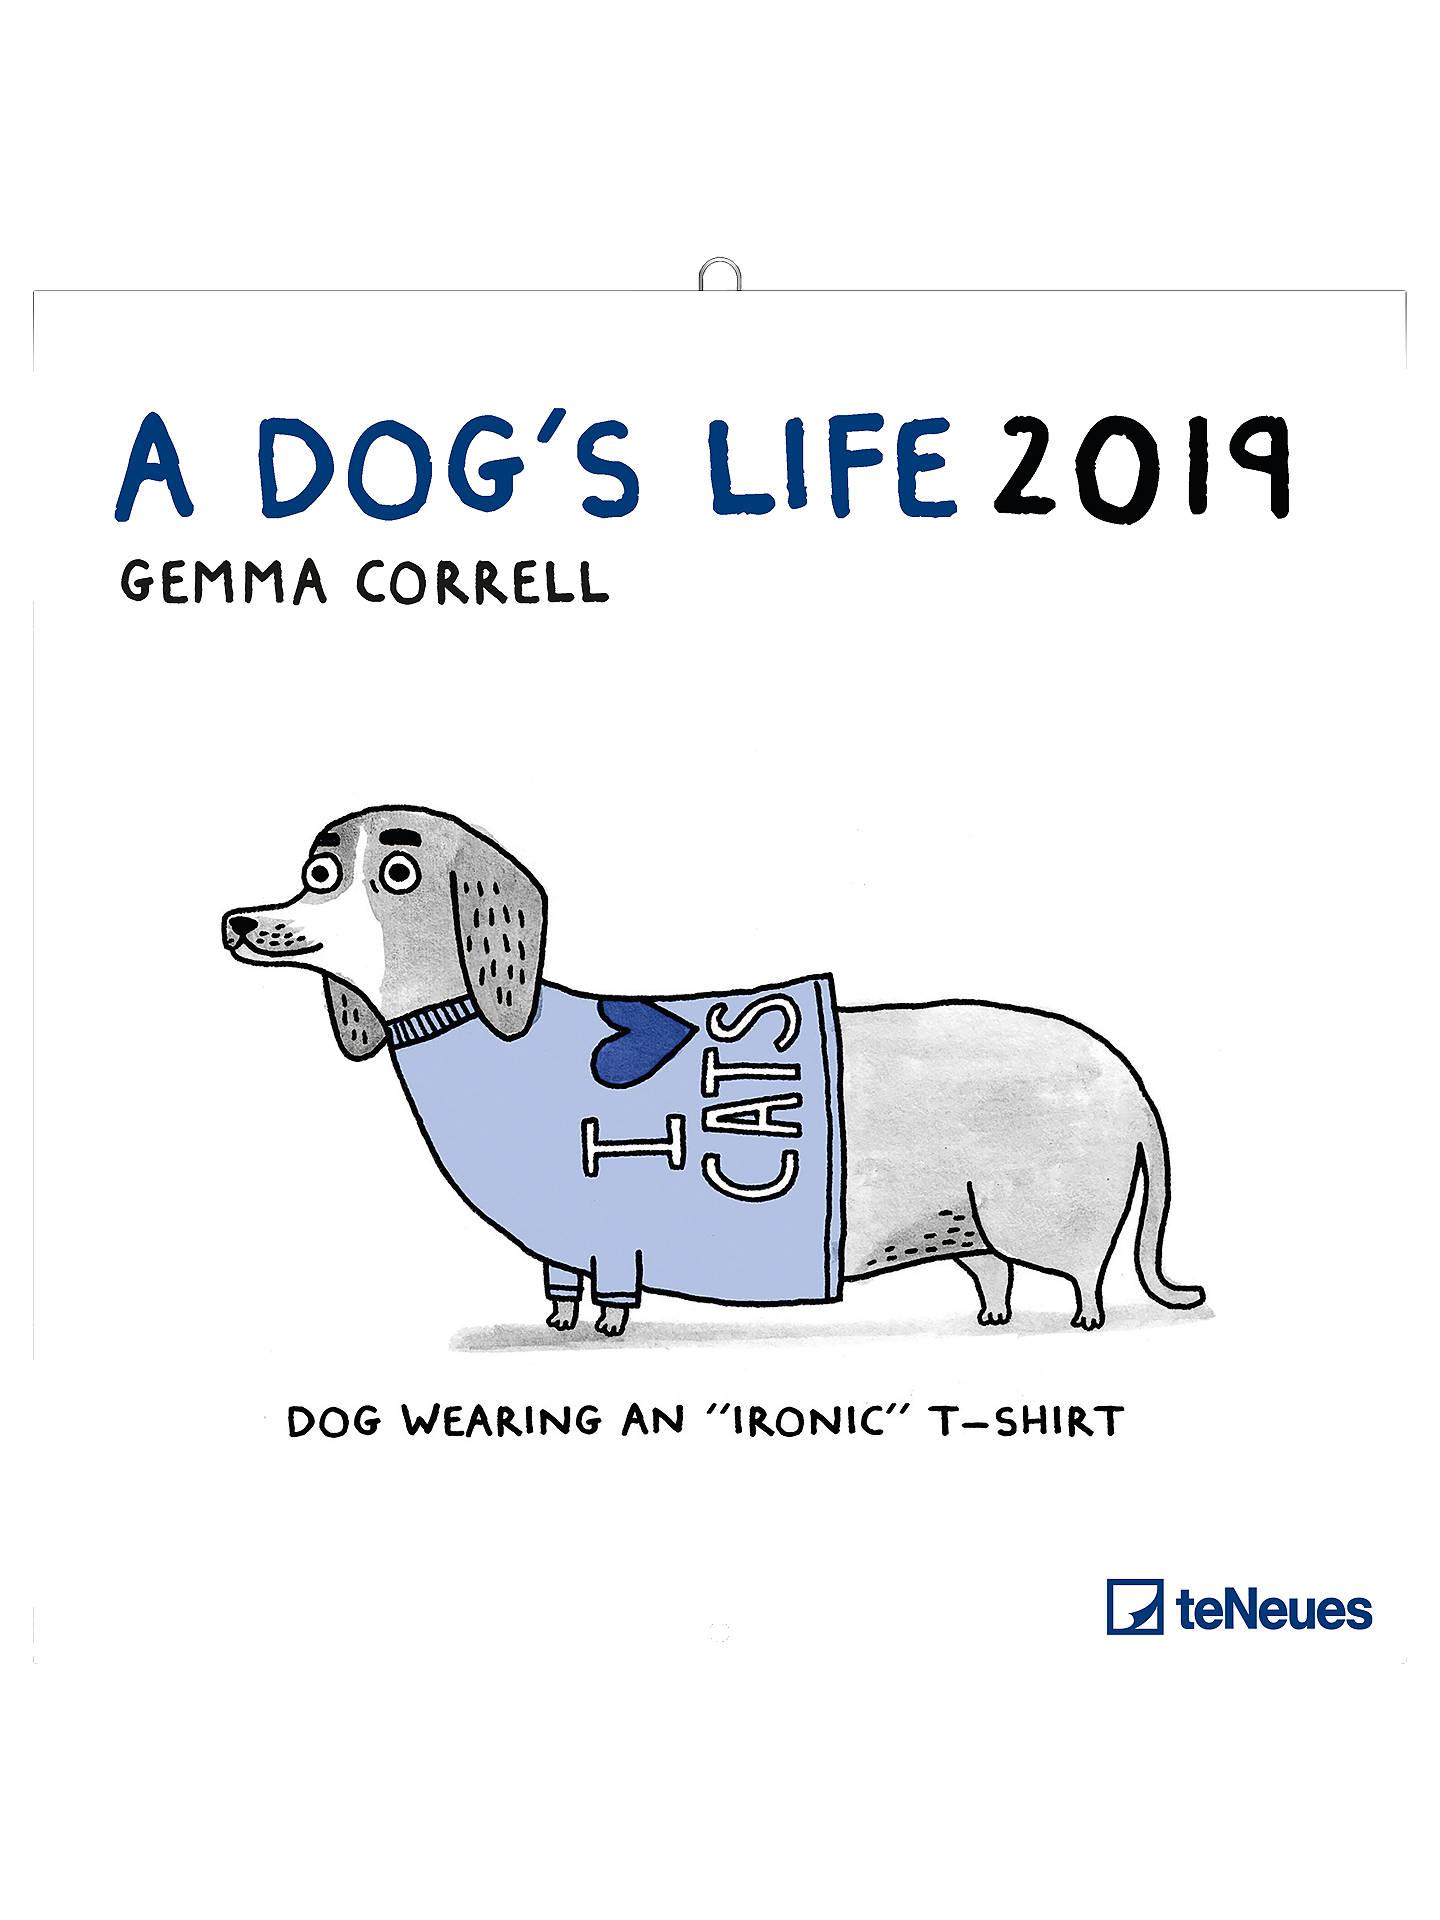 buy teneues gemma correll dogs life square 2019 calendar online at  johnlewis com